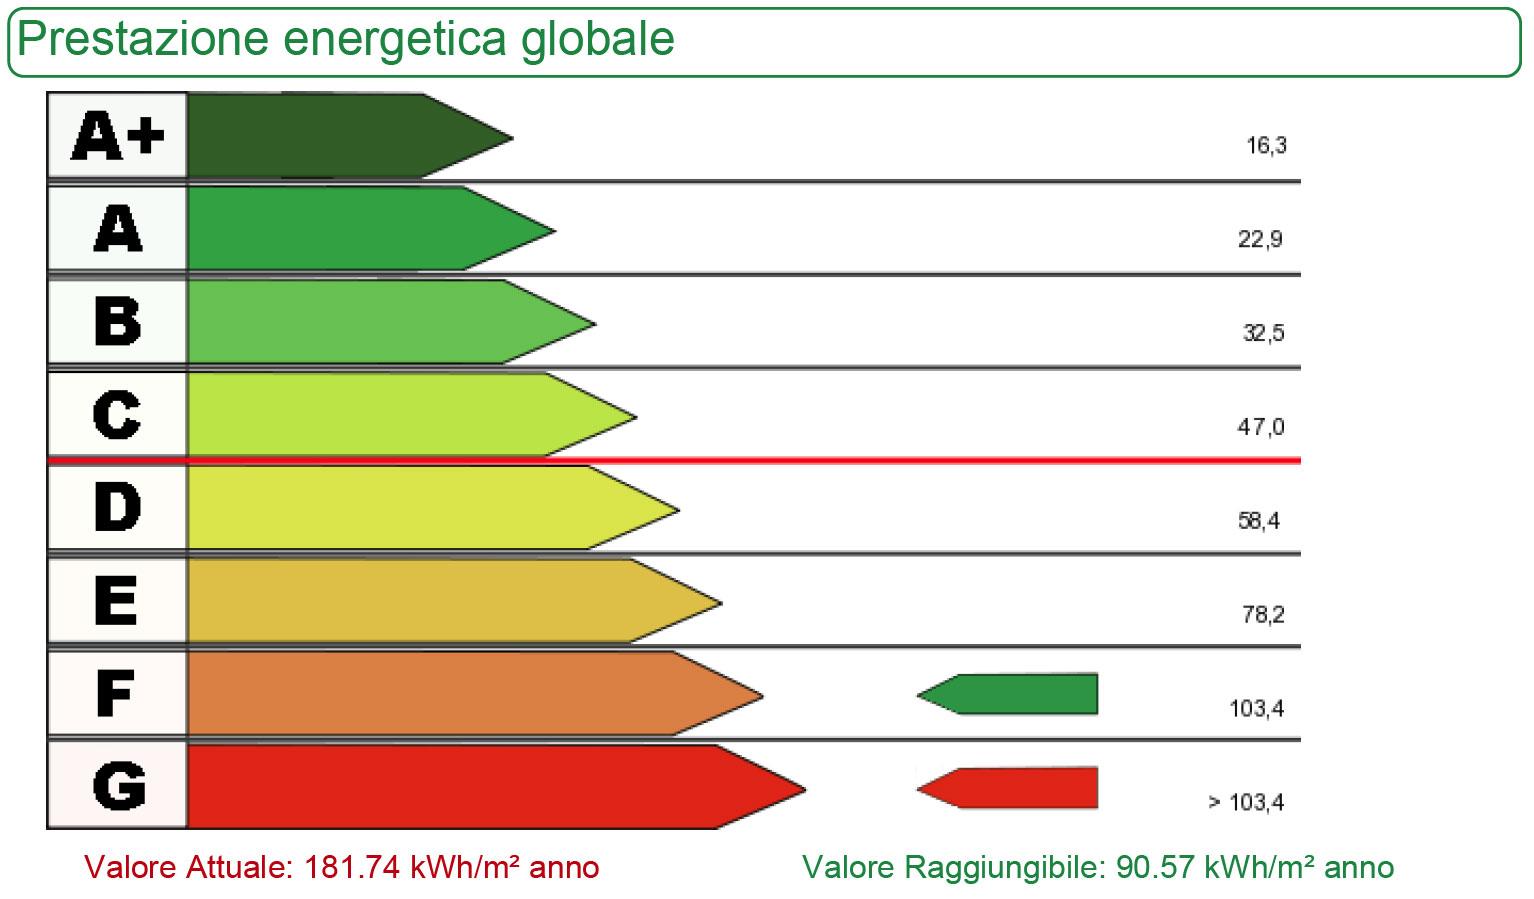 Classi Energetiche Edifici : Certificazione energetica cosa è importante sapere